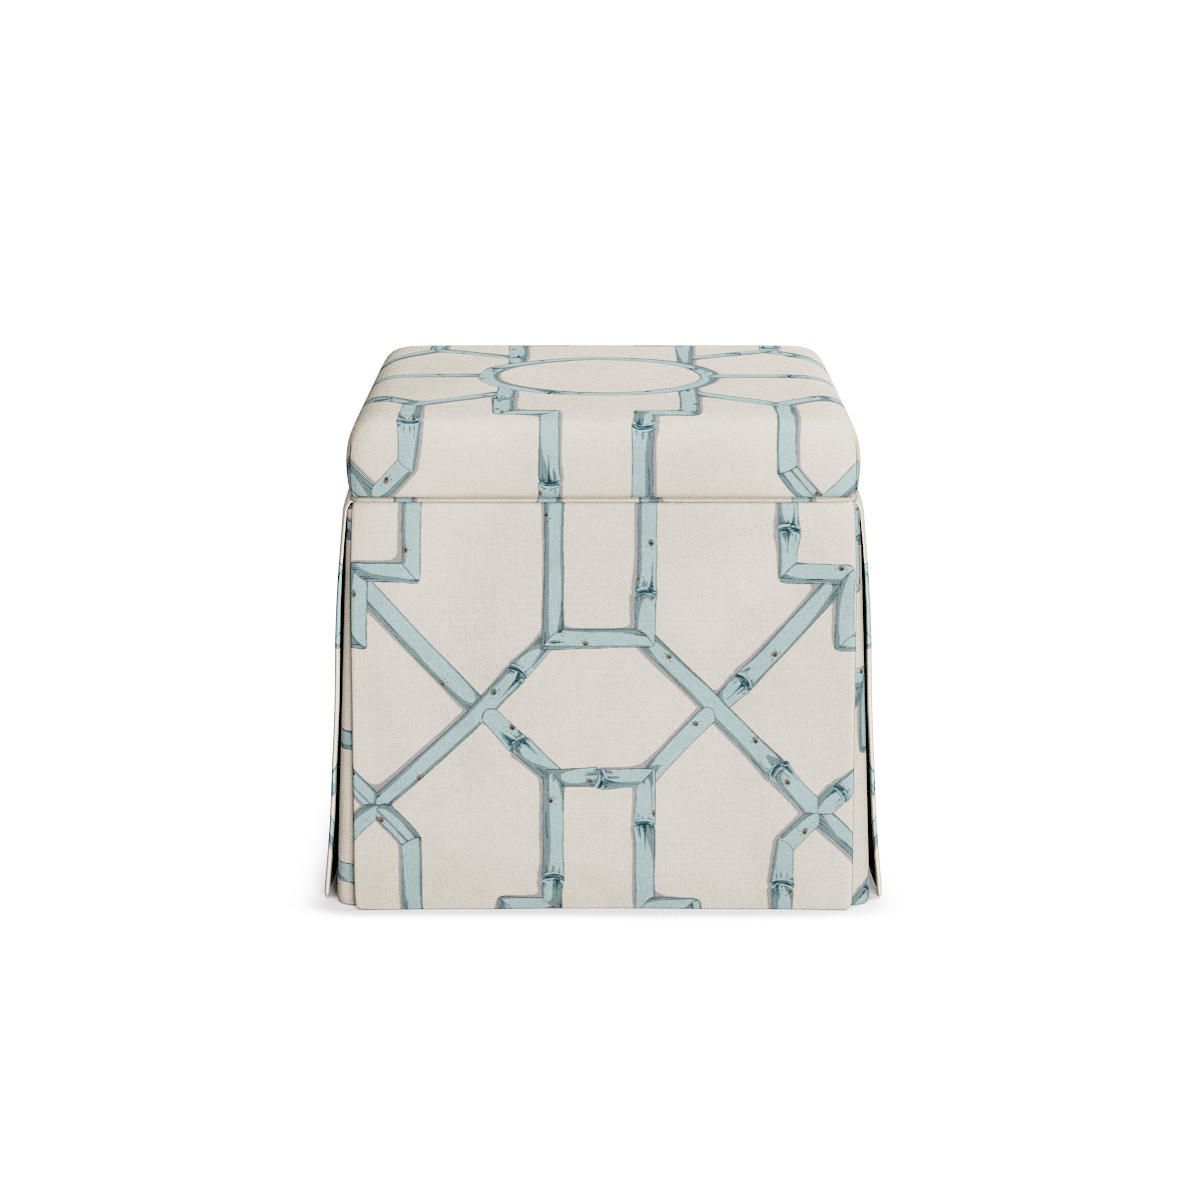 Magnificent Skirted Storage Ottoman Blue Baldwin Bamboo Inzonedesignstudio Interior Chair Design Inzonedesignstudiocom